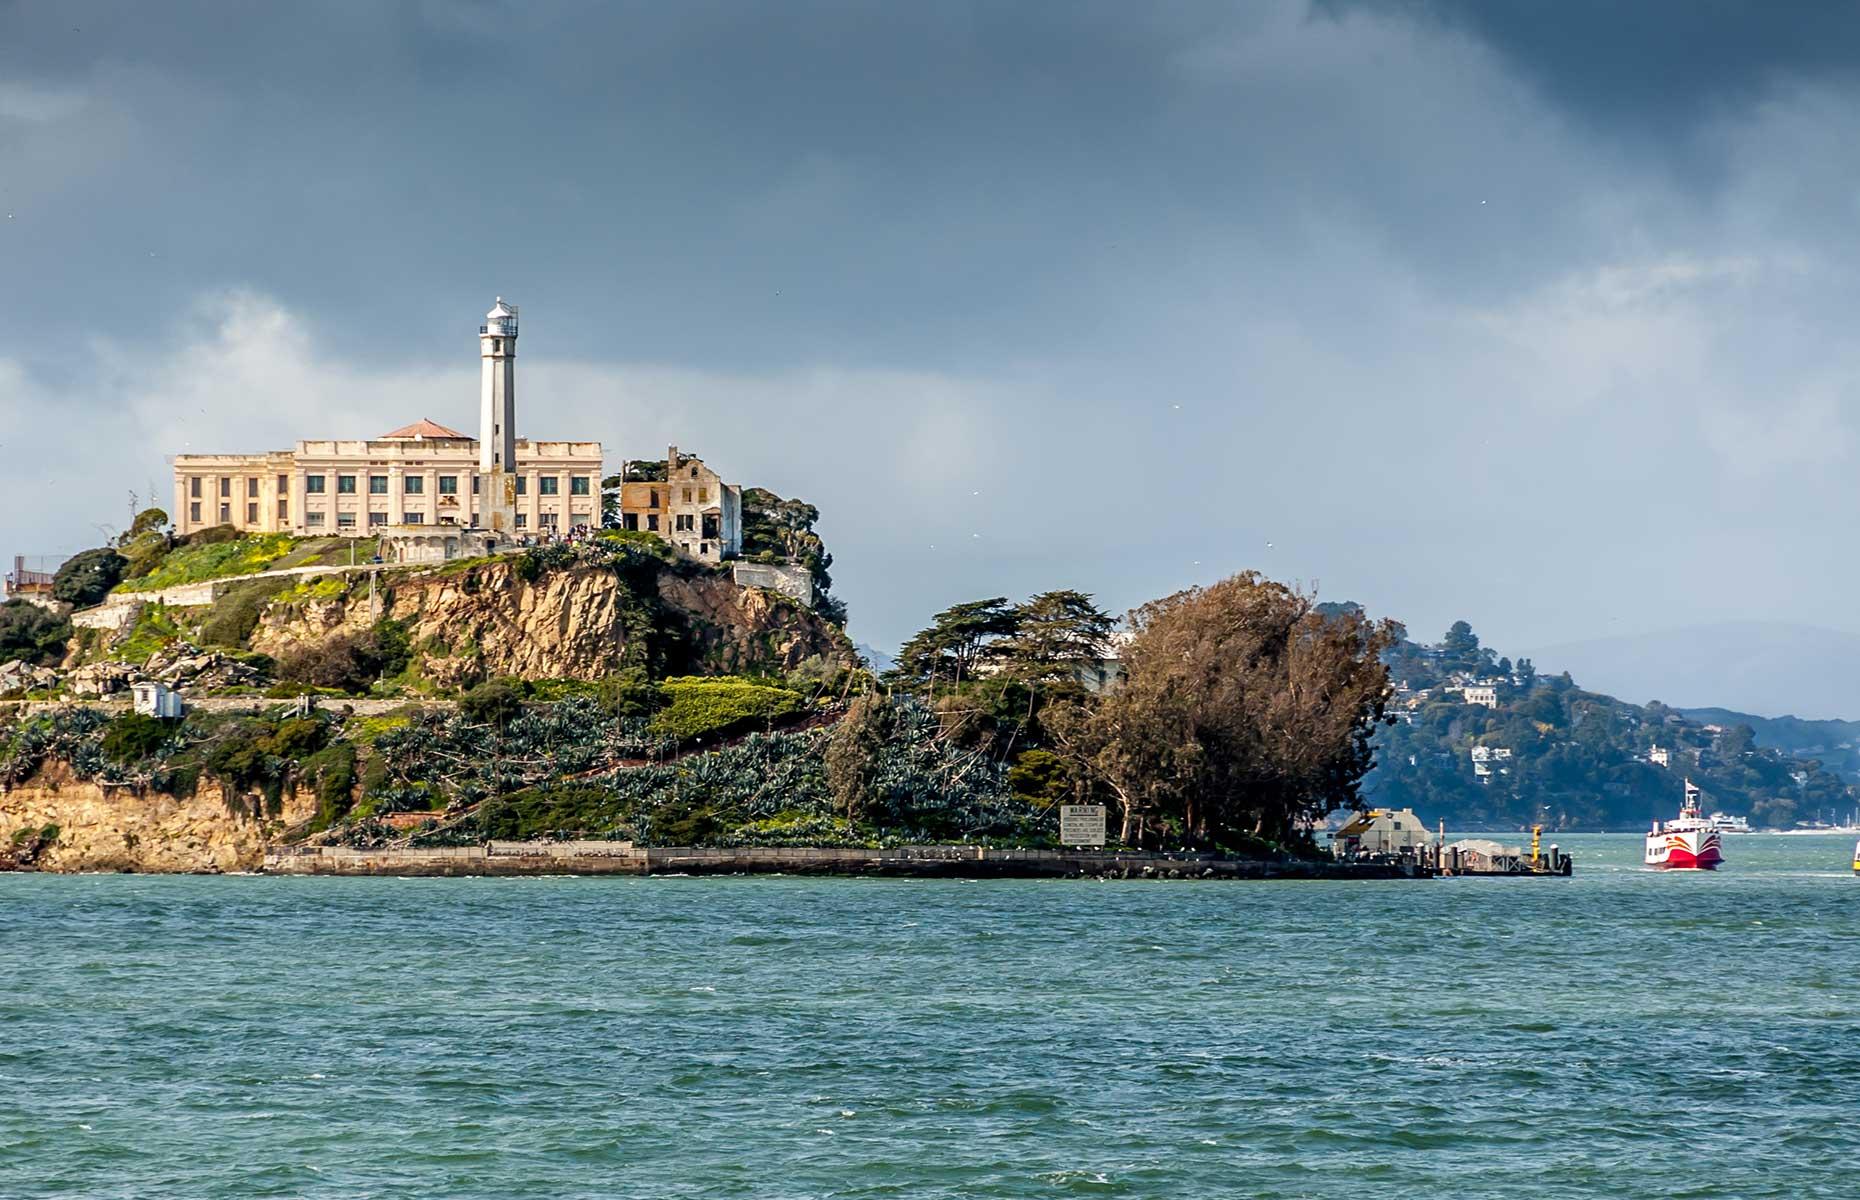 Alcatraz Island (Image: Jeff Whyte/Shutterstock)